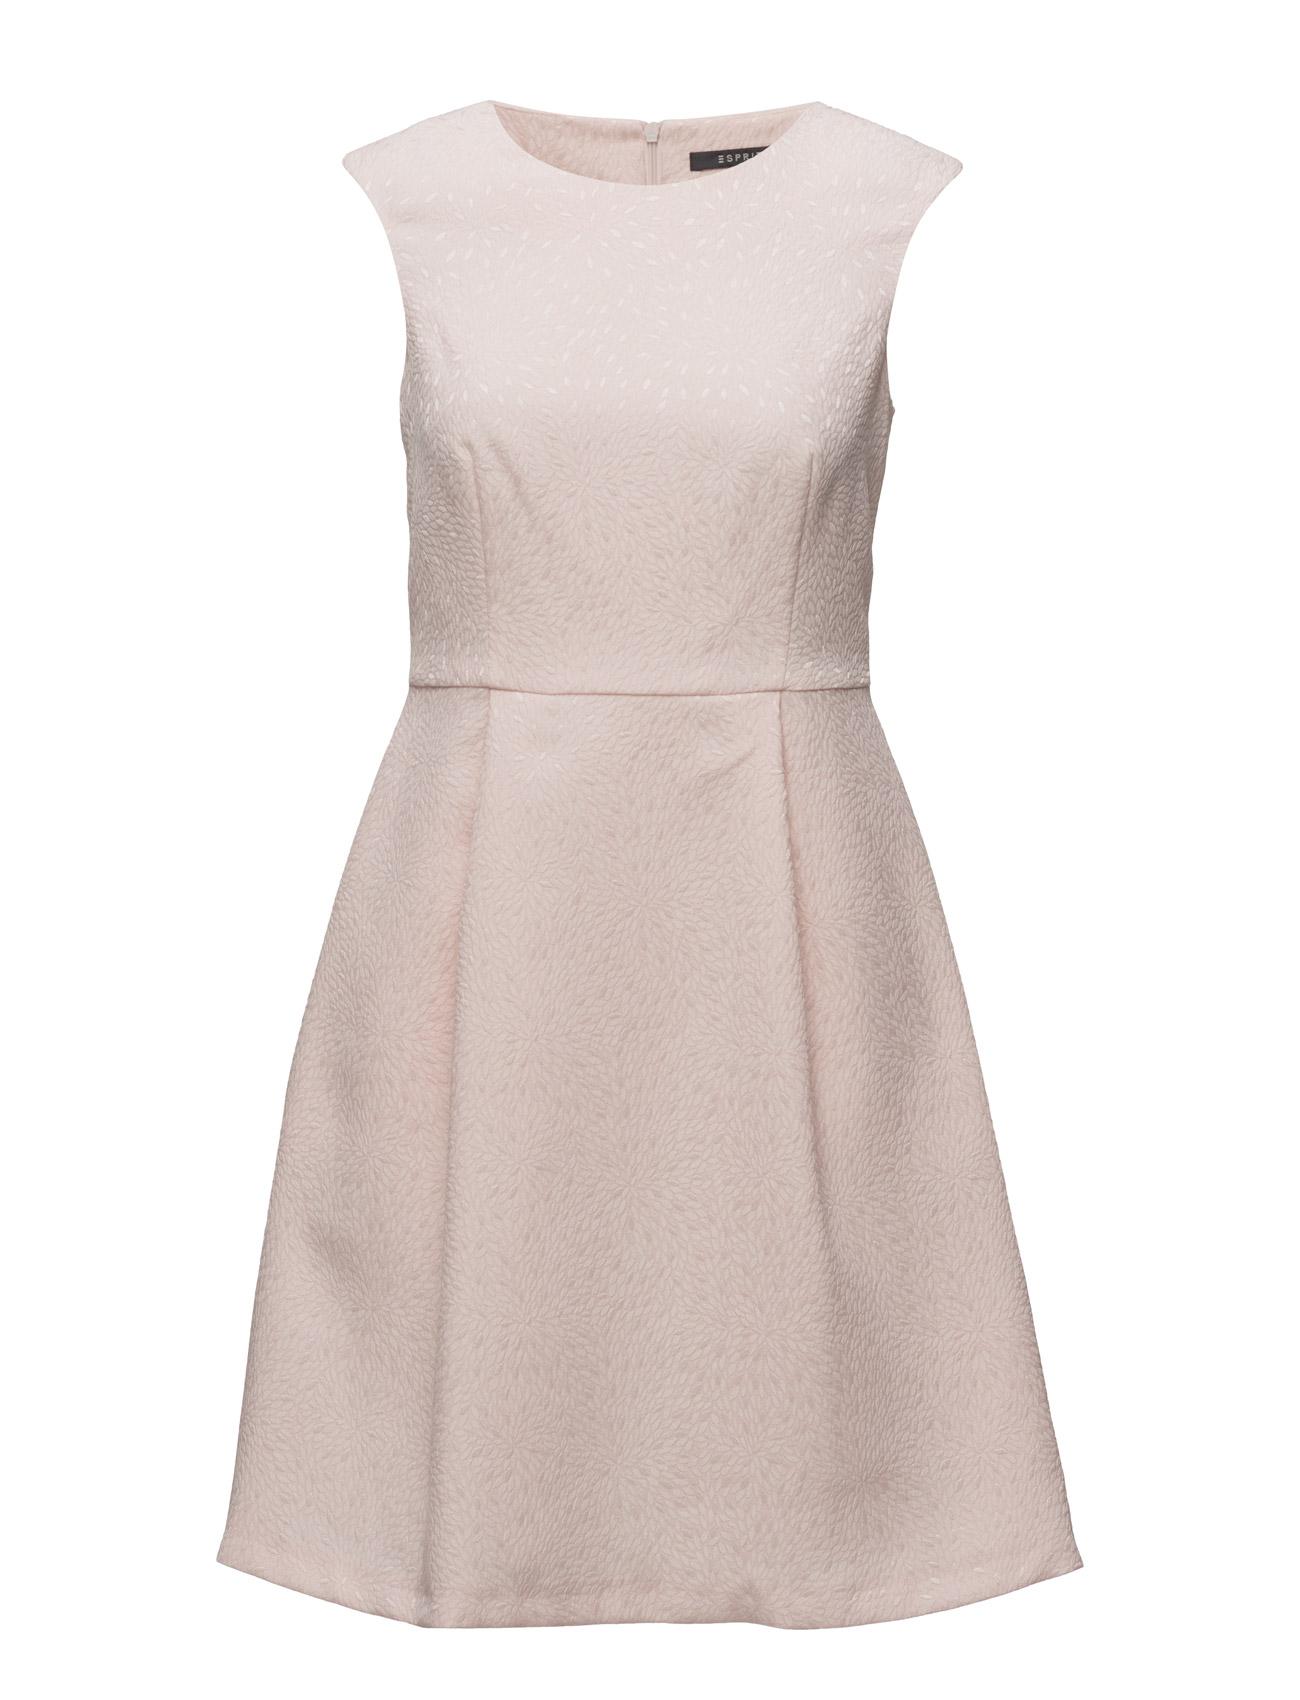 Dresses Woven Esprit Collection Kne & Medium til  - MoteJakten.no